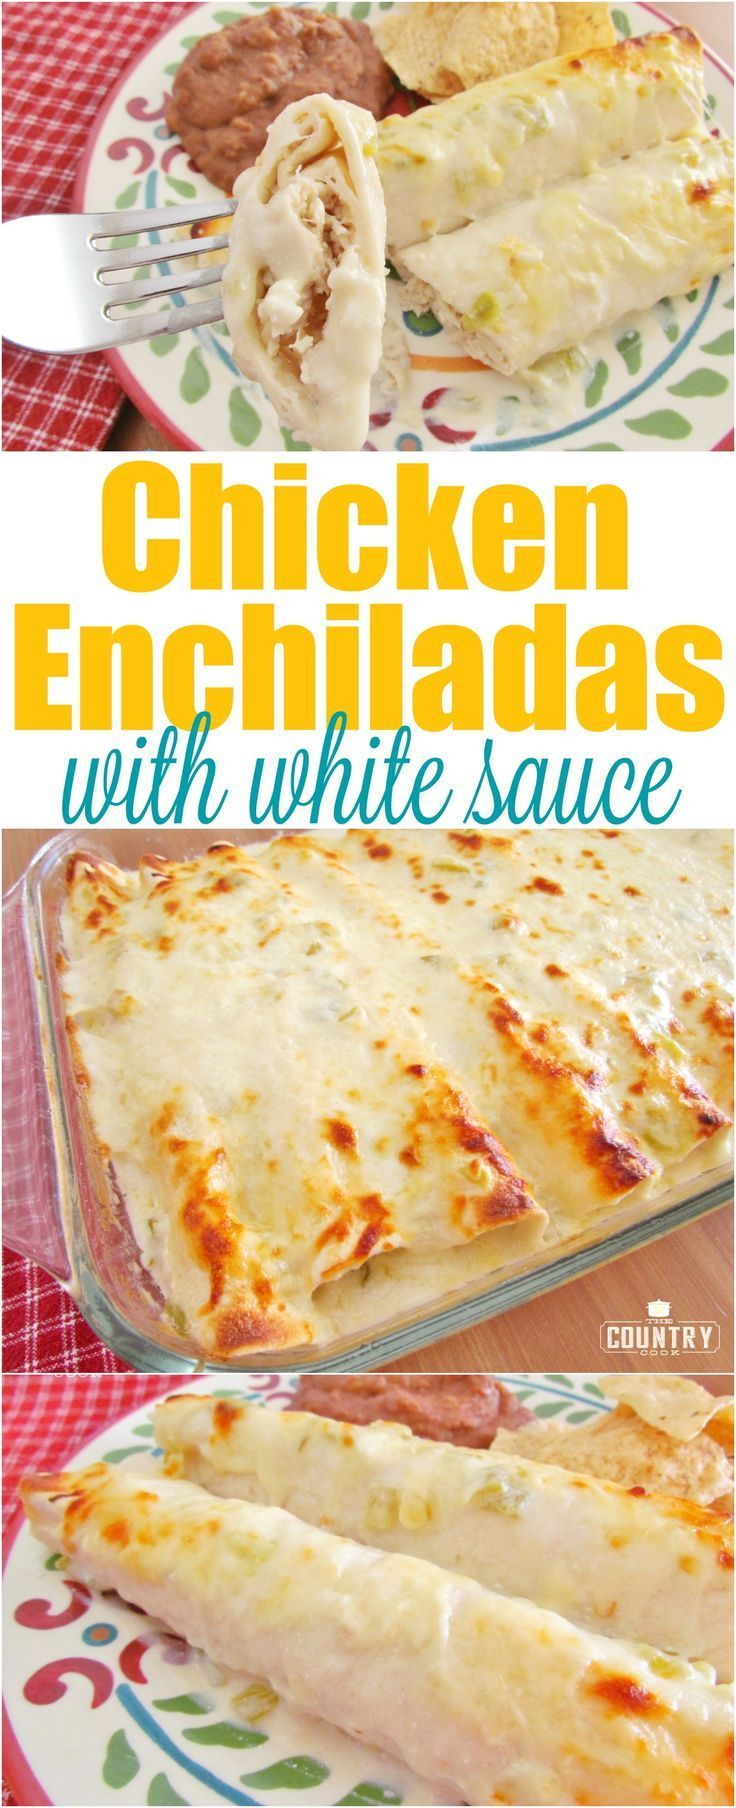 Creamy White Chicken Enchiladas Recipe Mexican Food Recipes Recipes Mexican Food Recipes Authentic